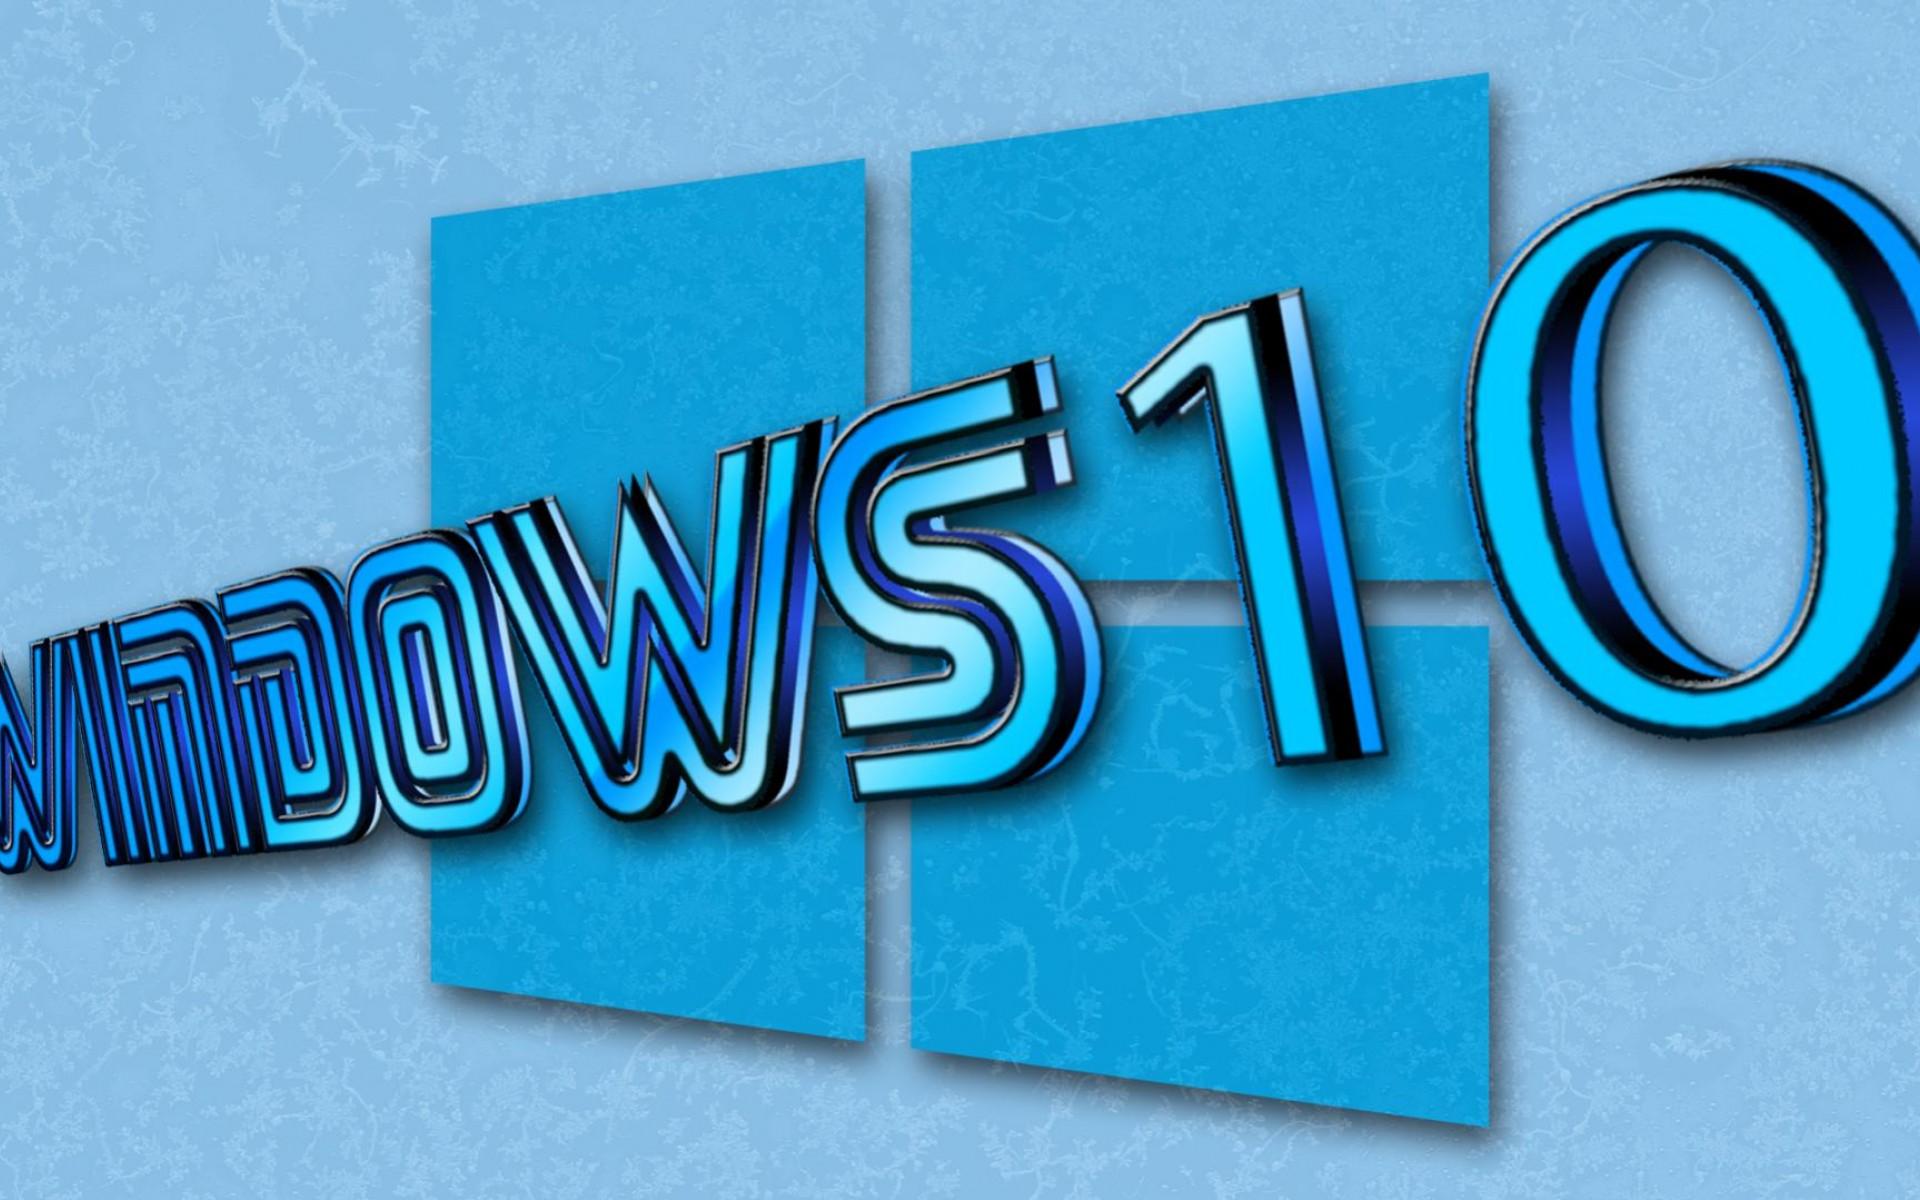 Windows 10 Logo wallpaper 1920x1200   Wallpaper   Wallpaper Style 1920x1200